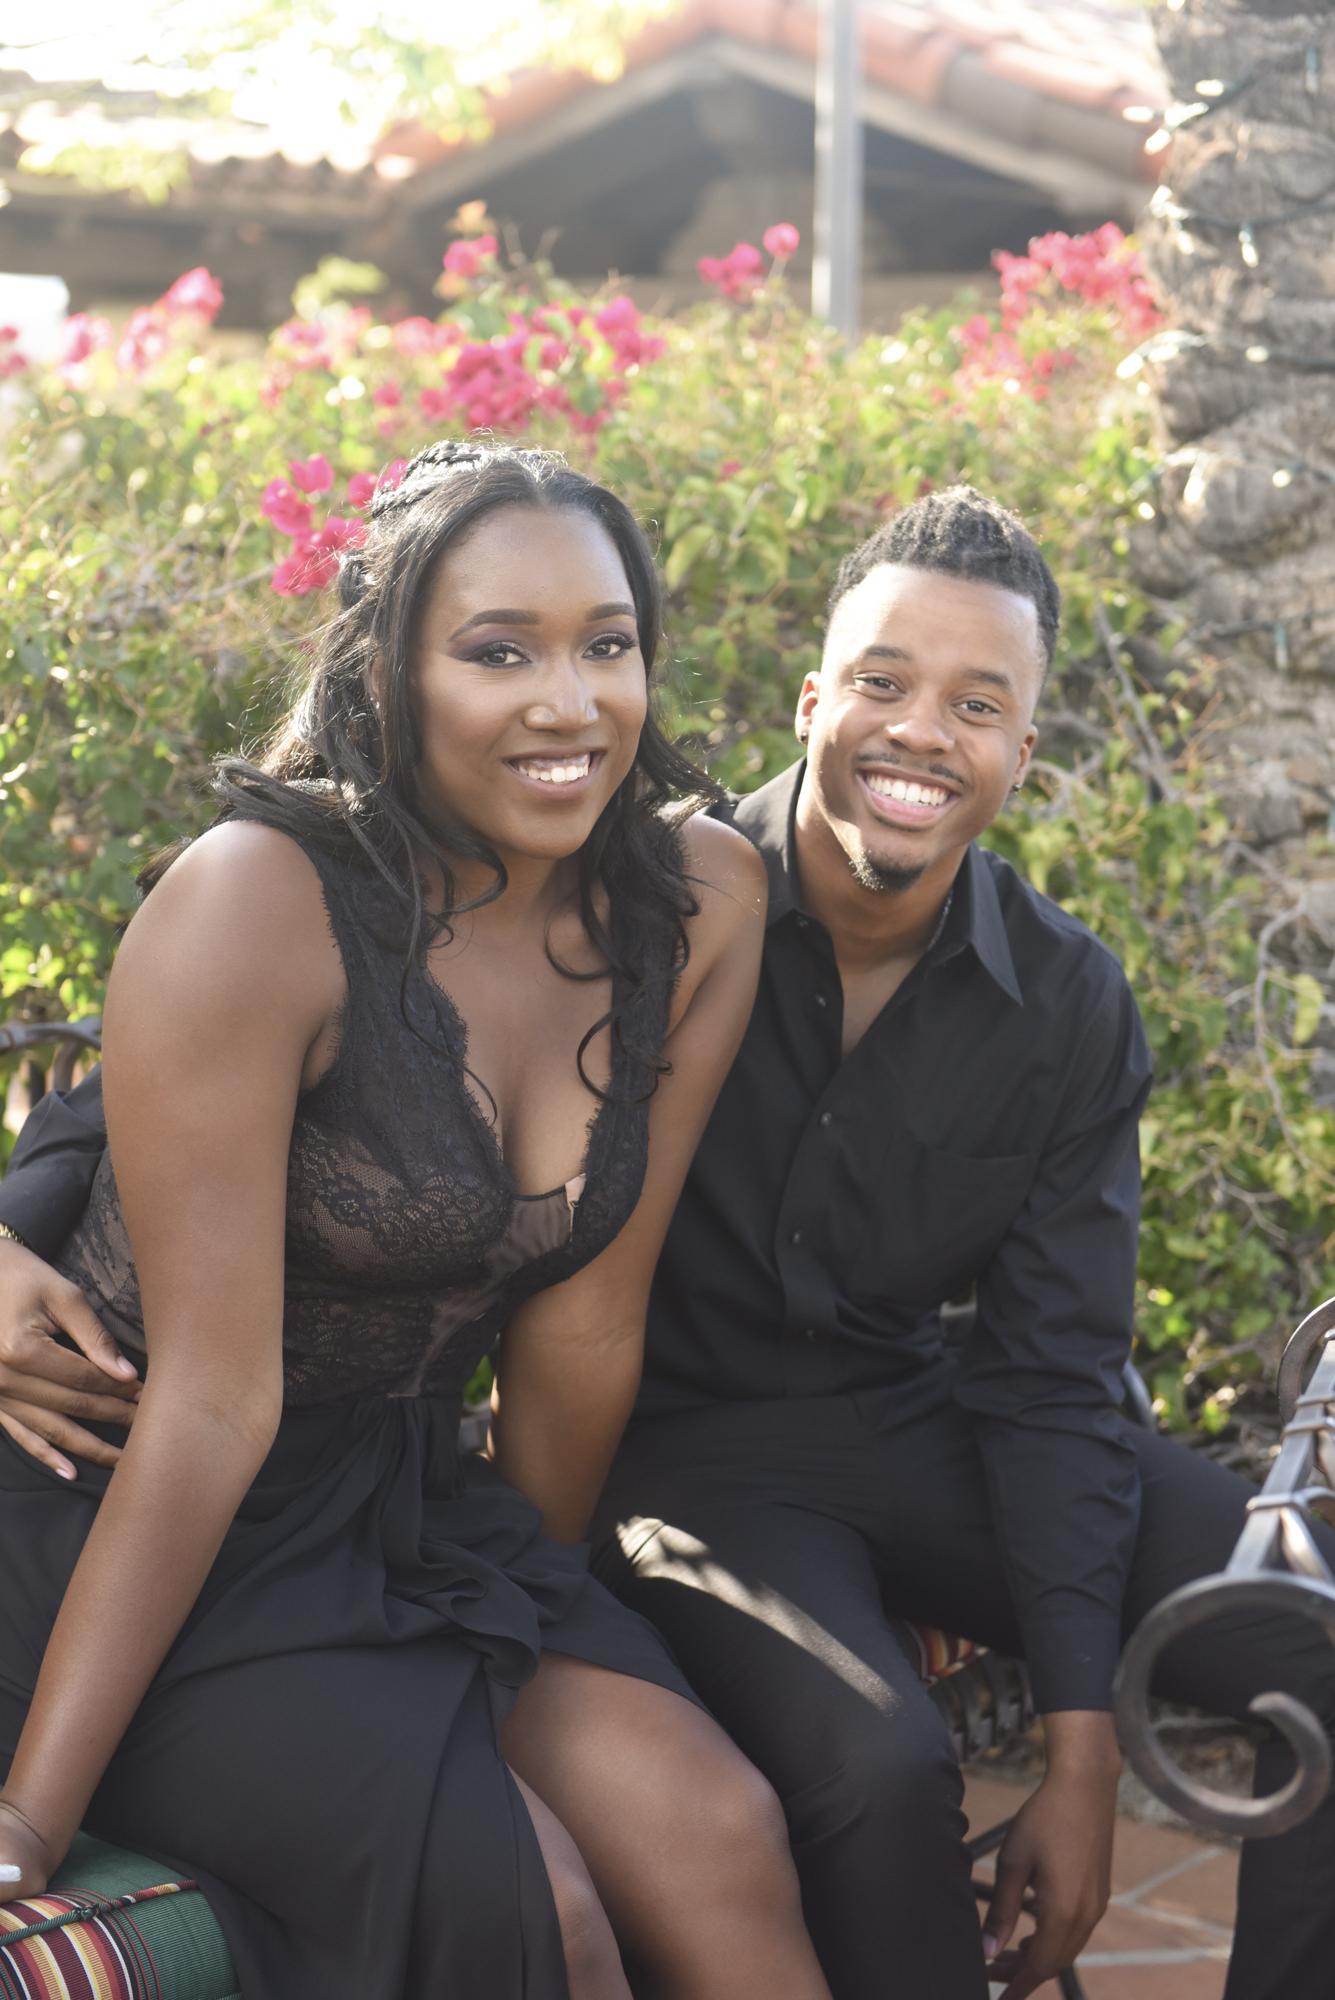 arthousephotographs.com | California Ranch Wedding | Southern California Wedding Photographer | Southern California Wedding Photographer | Arthouse Photographs